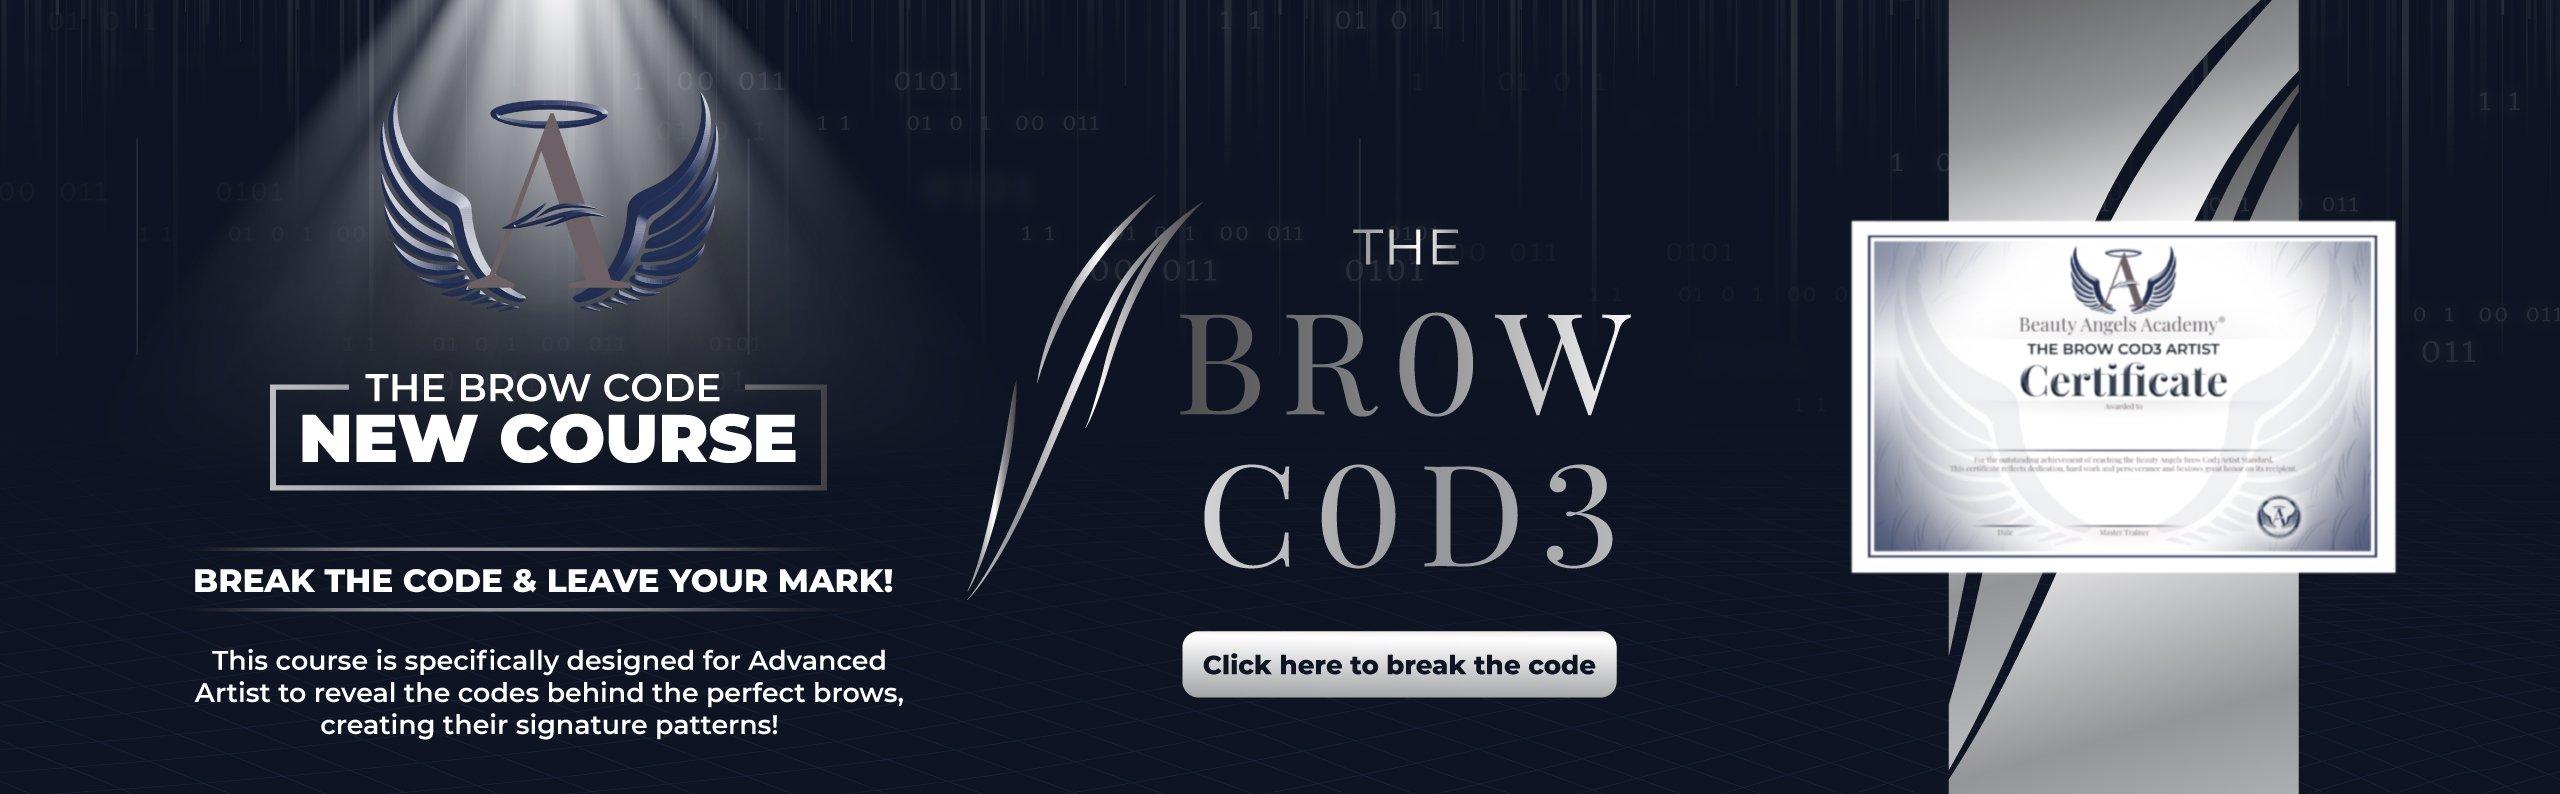 Brow-Code